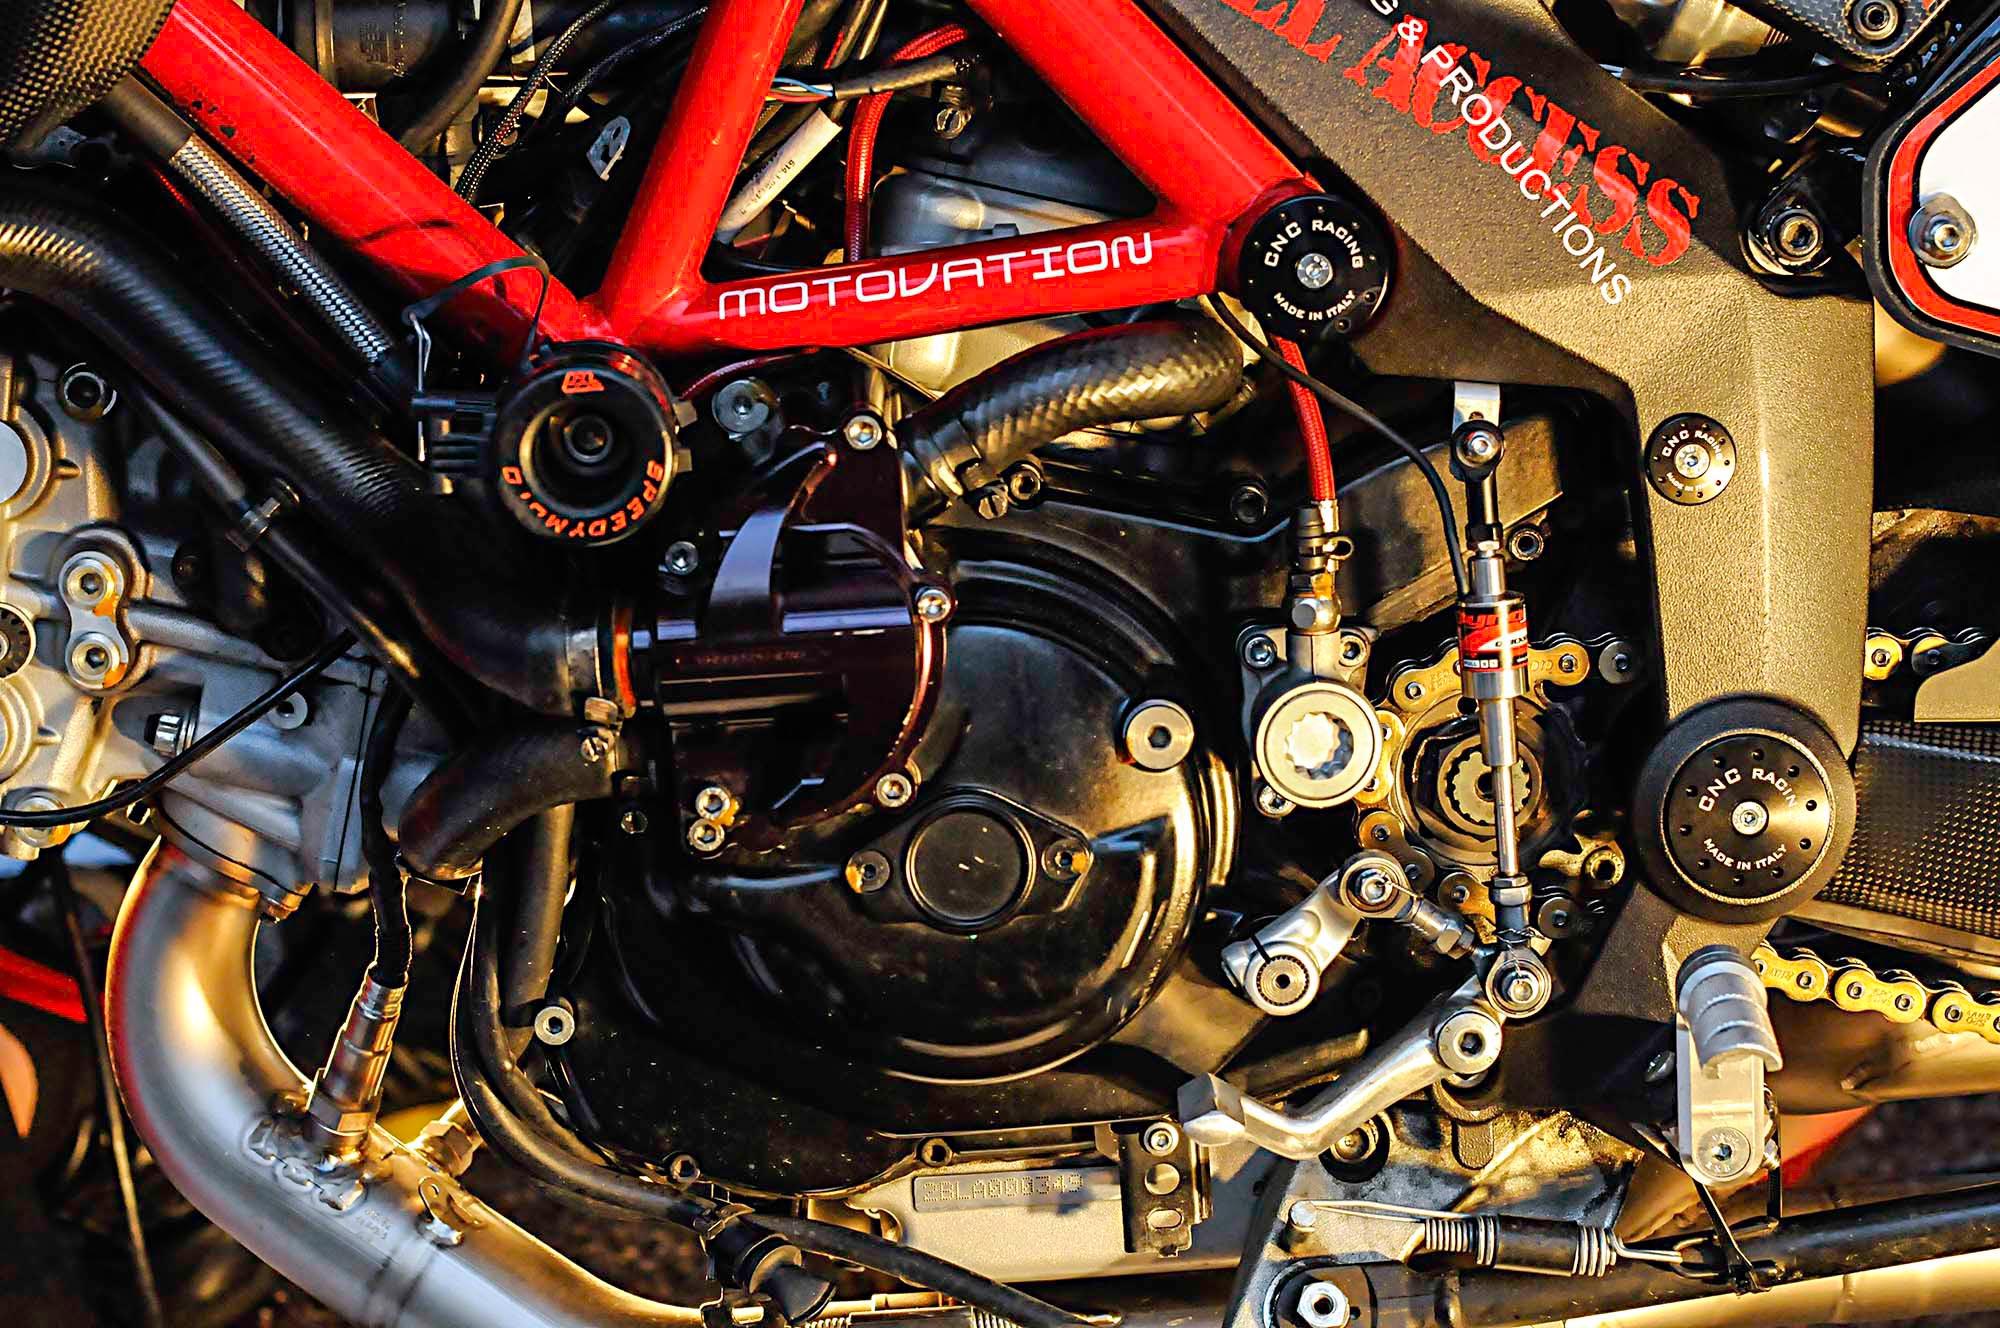 2013 Ducati Multistrada 1200 S Pikes Peak Racing Bike Xxx